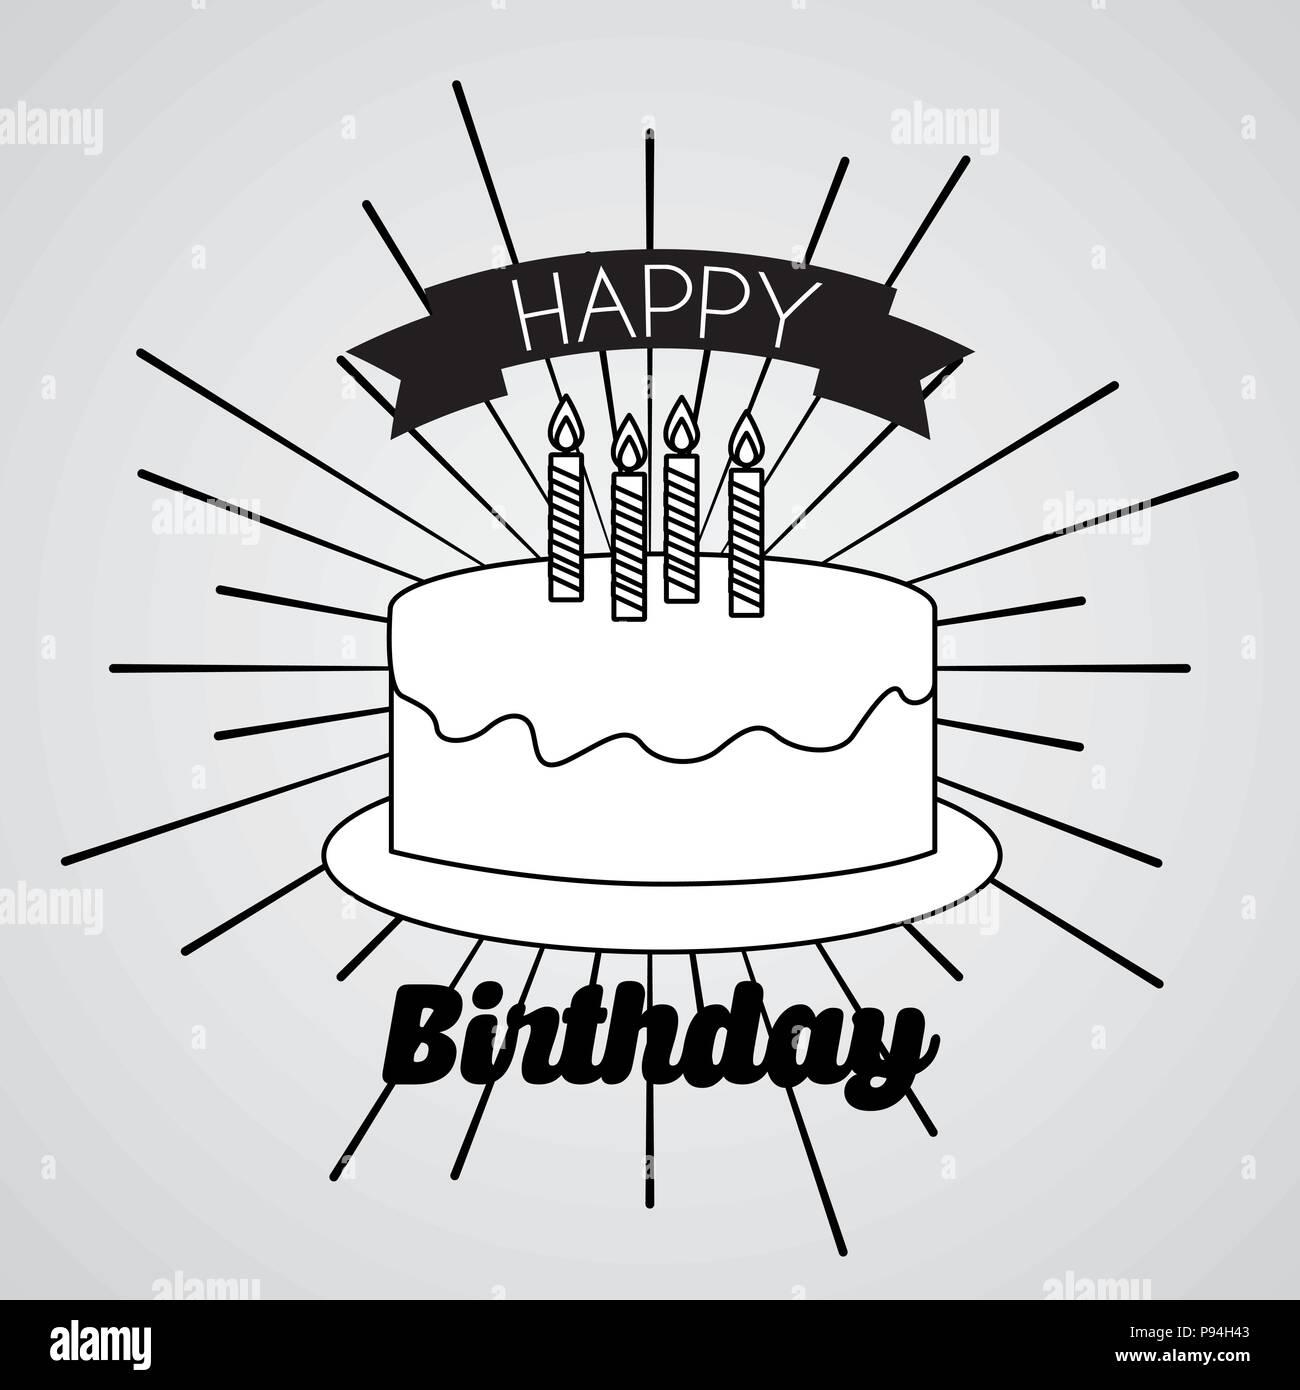 Strange Happy Birthday Card Draw Cake Candless Ribbon Vector Illustration Funny Birthday Cards Online Fluifree Goldxyz